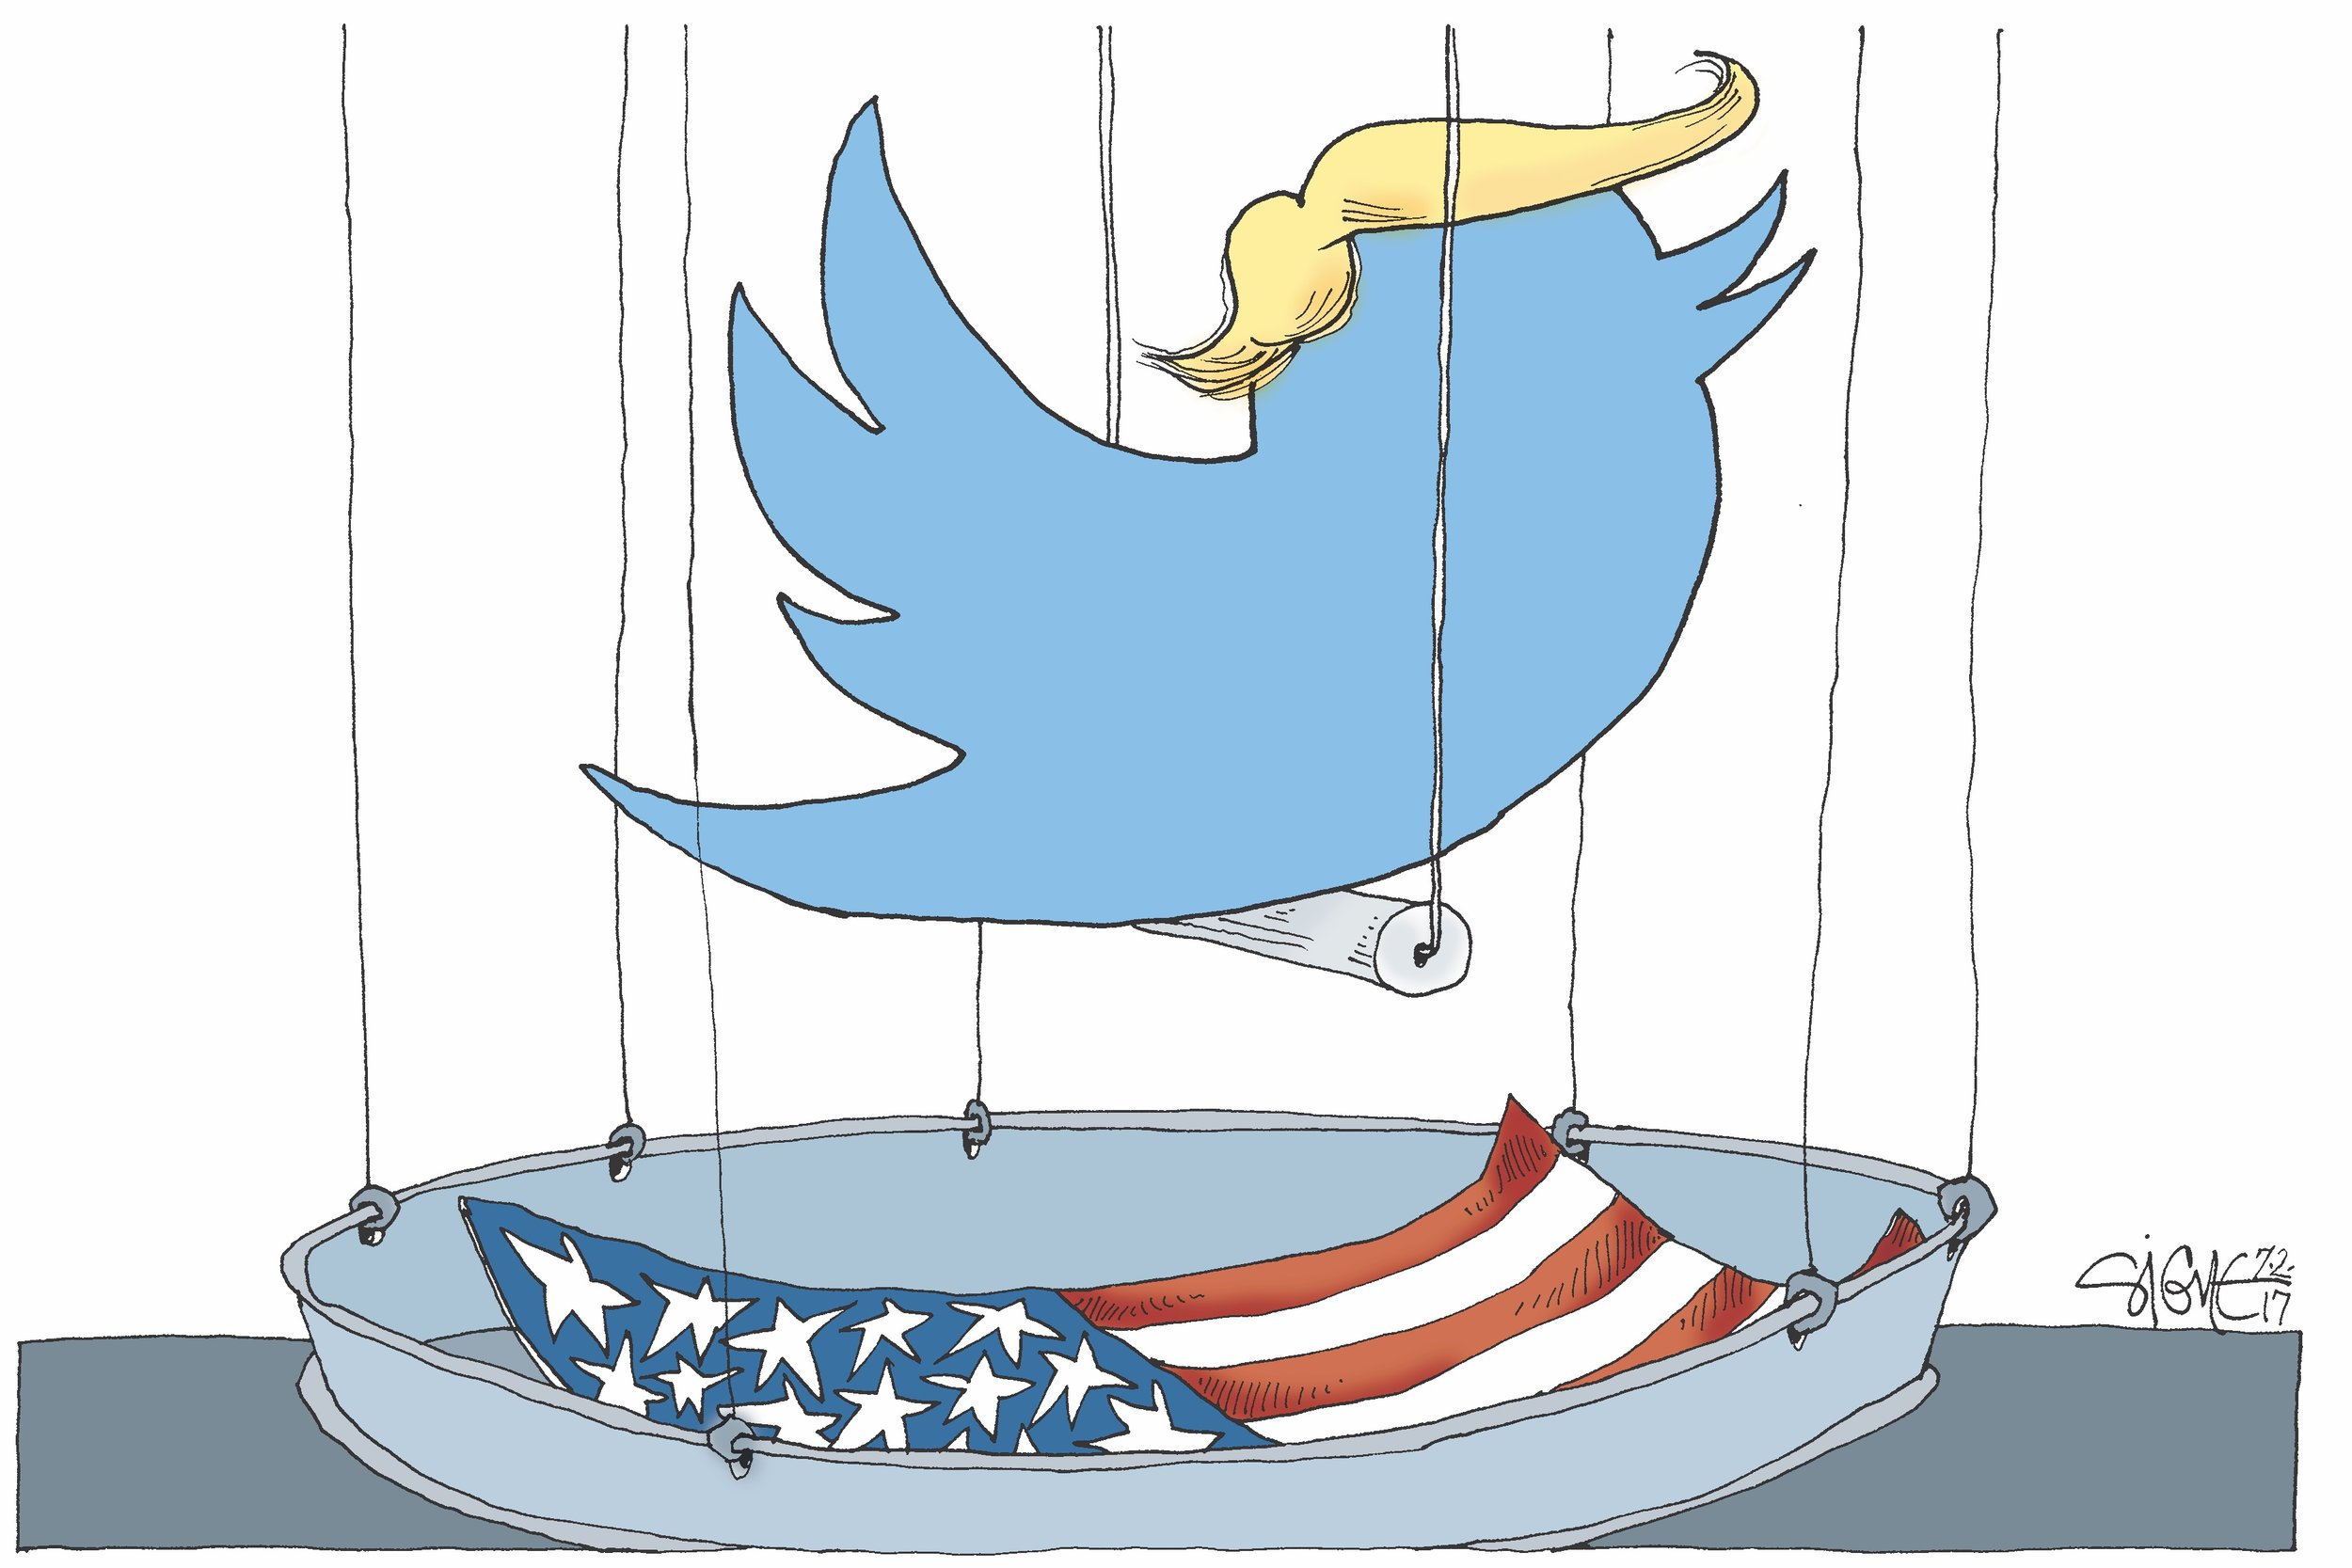 07-02-17 Twitter TrumpC copy.jpg